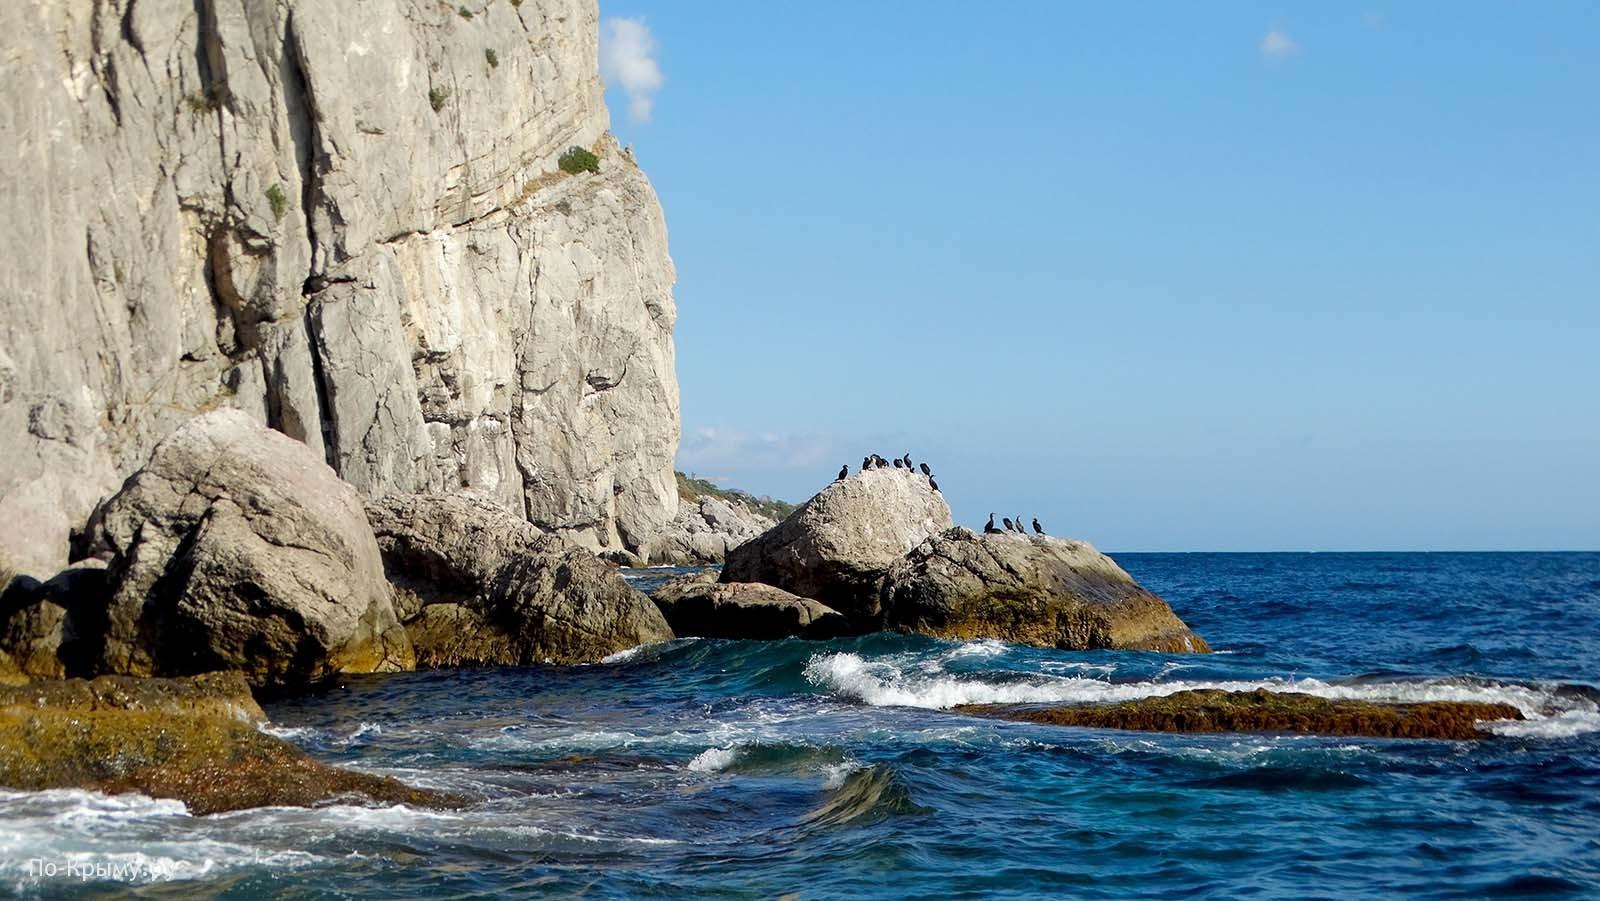 Крым, морская экскурсия к мысу Айя из Балаклавы